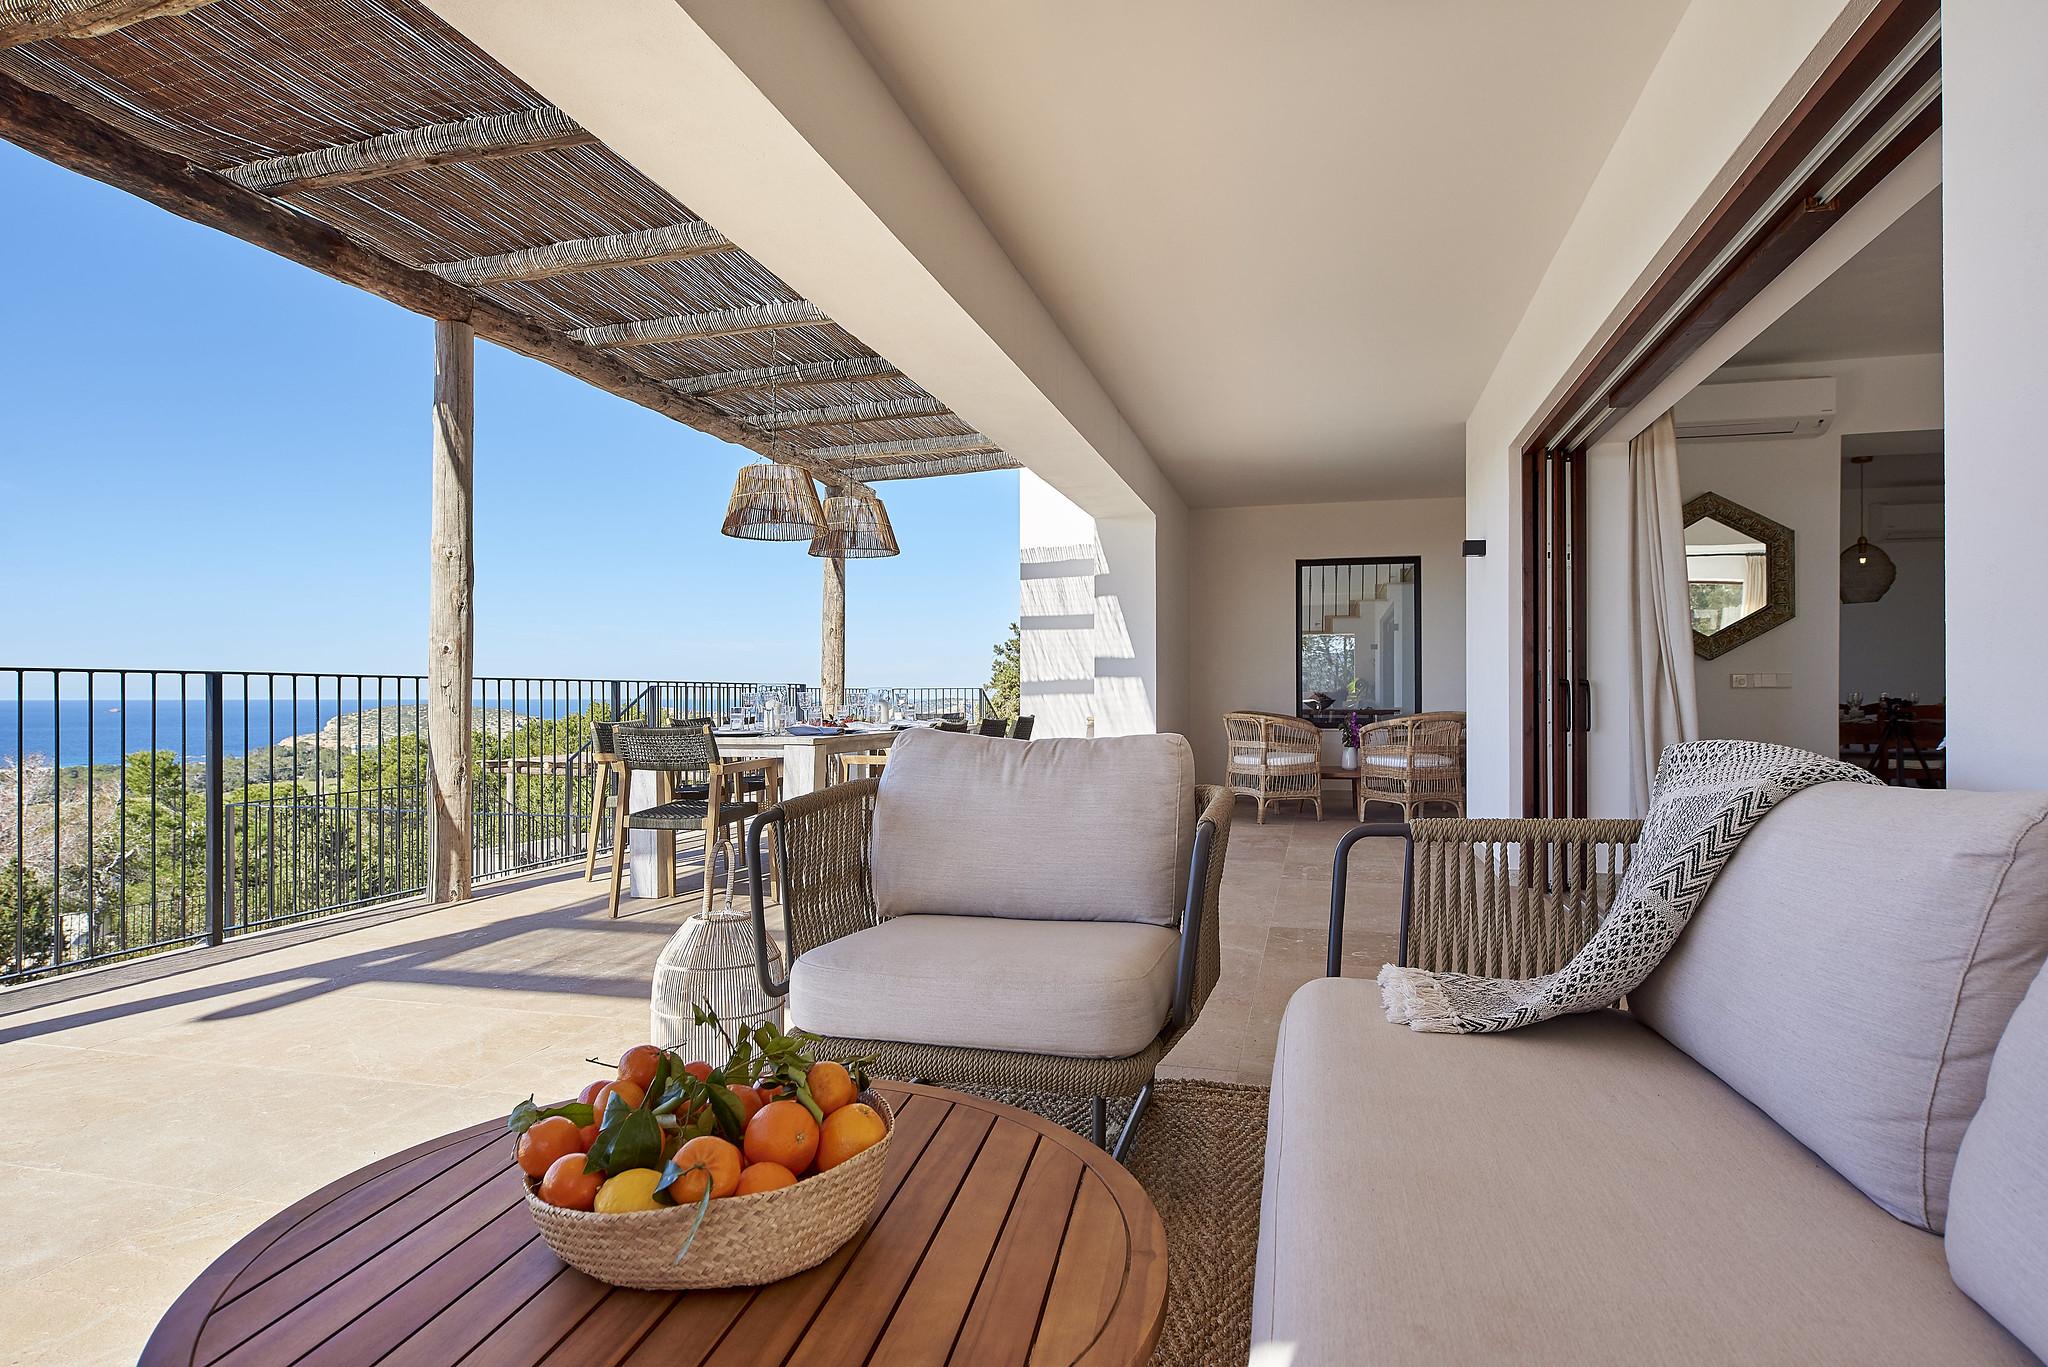 https://www.white-ibiza.com/wp-content/uploads/2020/06/white-ibiza-villas-sa-serra-exterior-terrace-seating.jpg